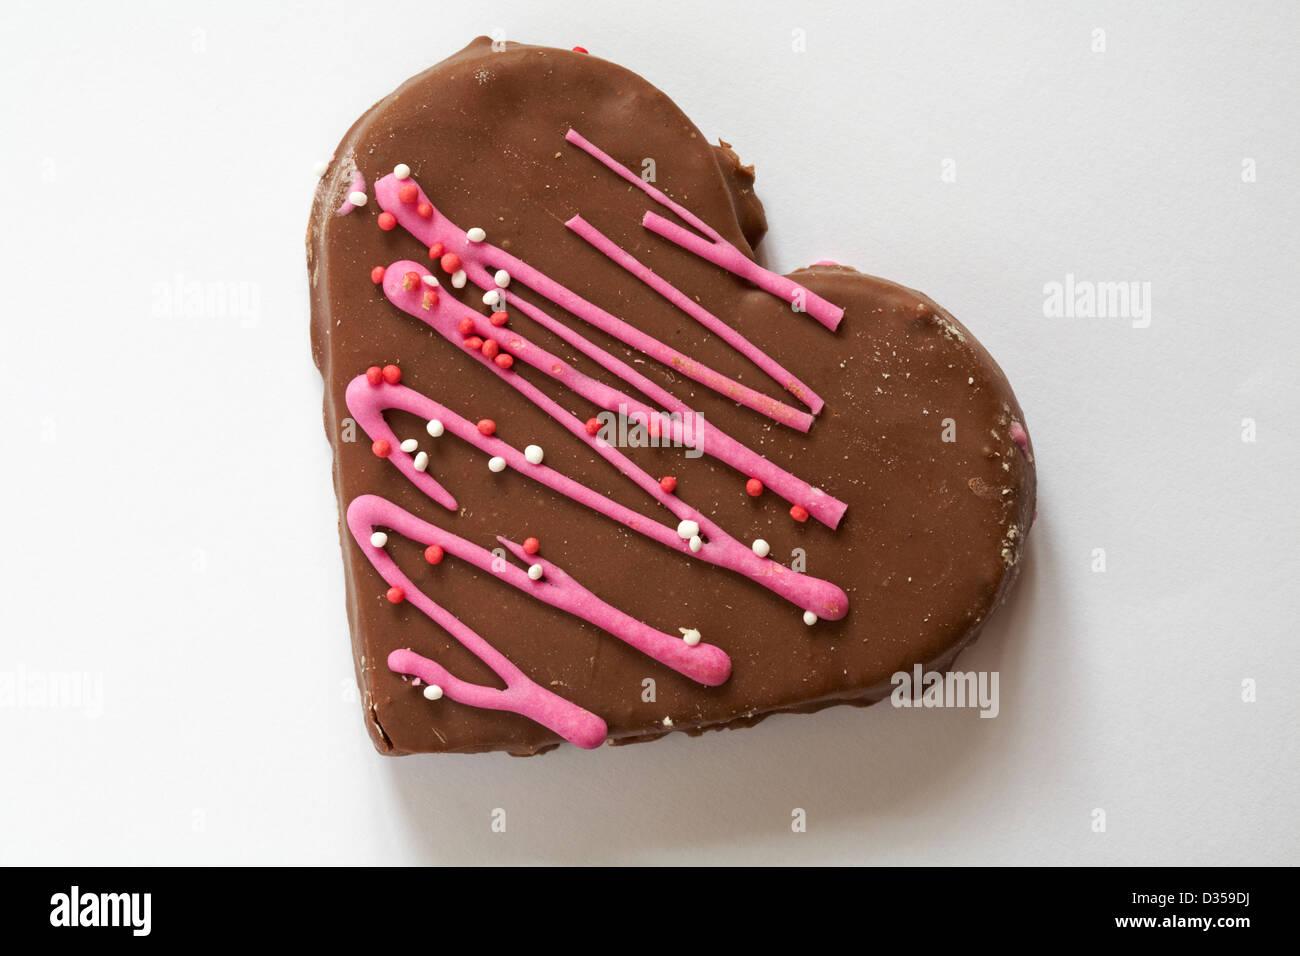 Valentine Chocolate Heart Cake Heart Shaped Cake Isolated On White